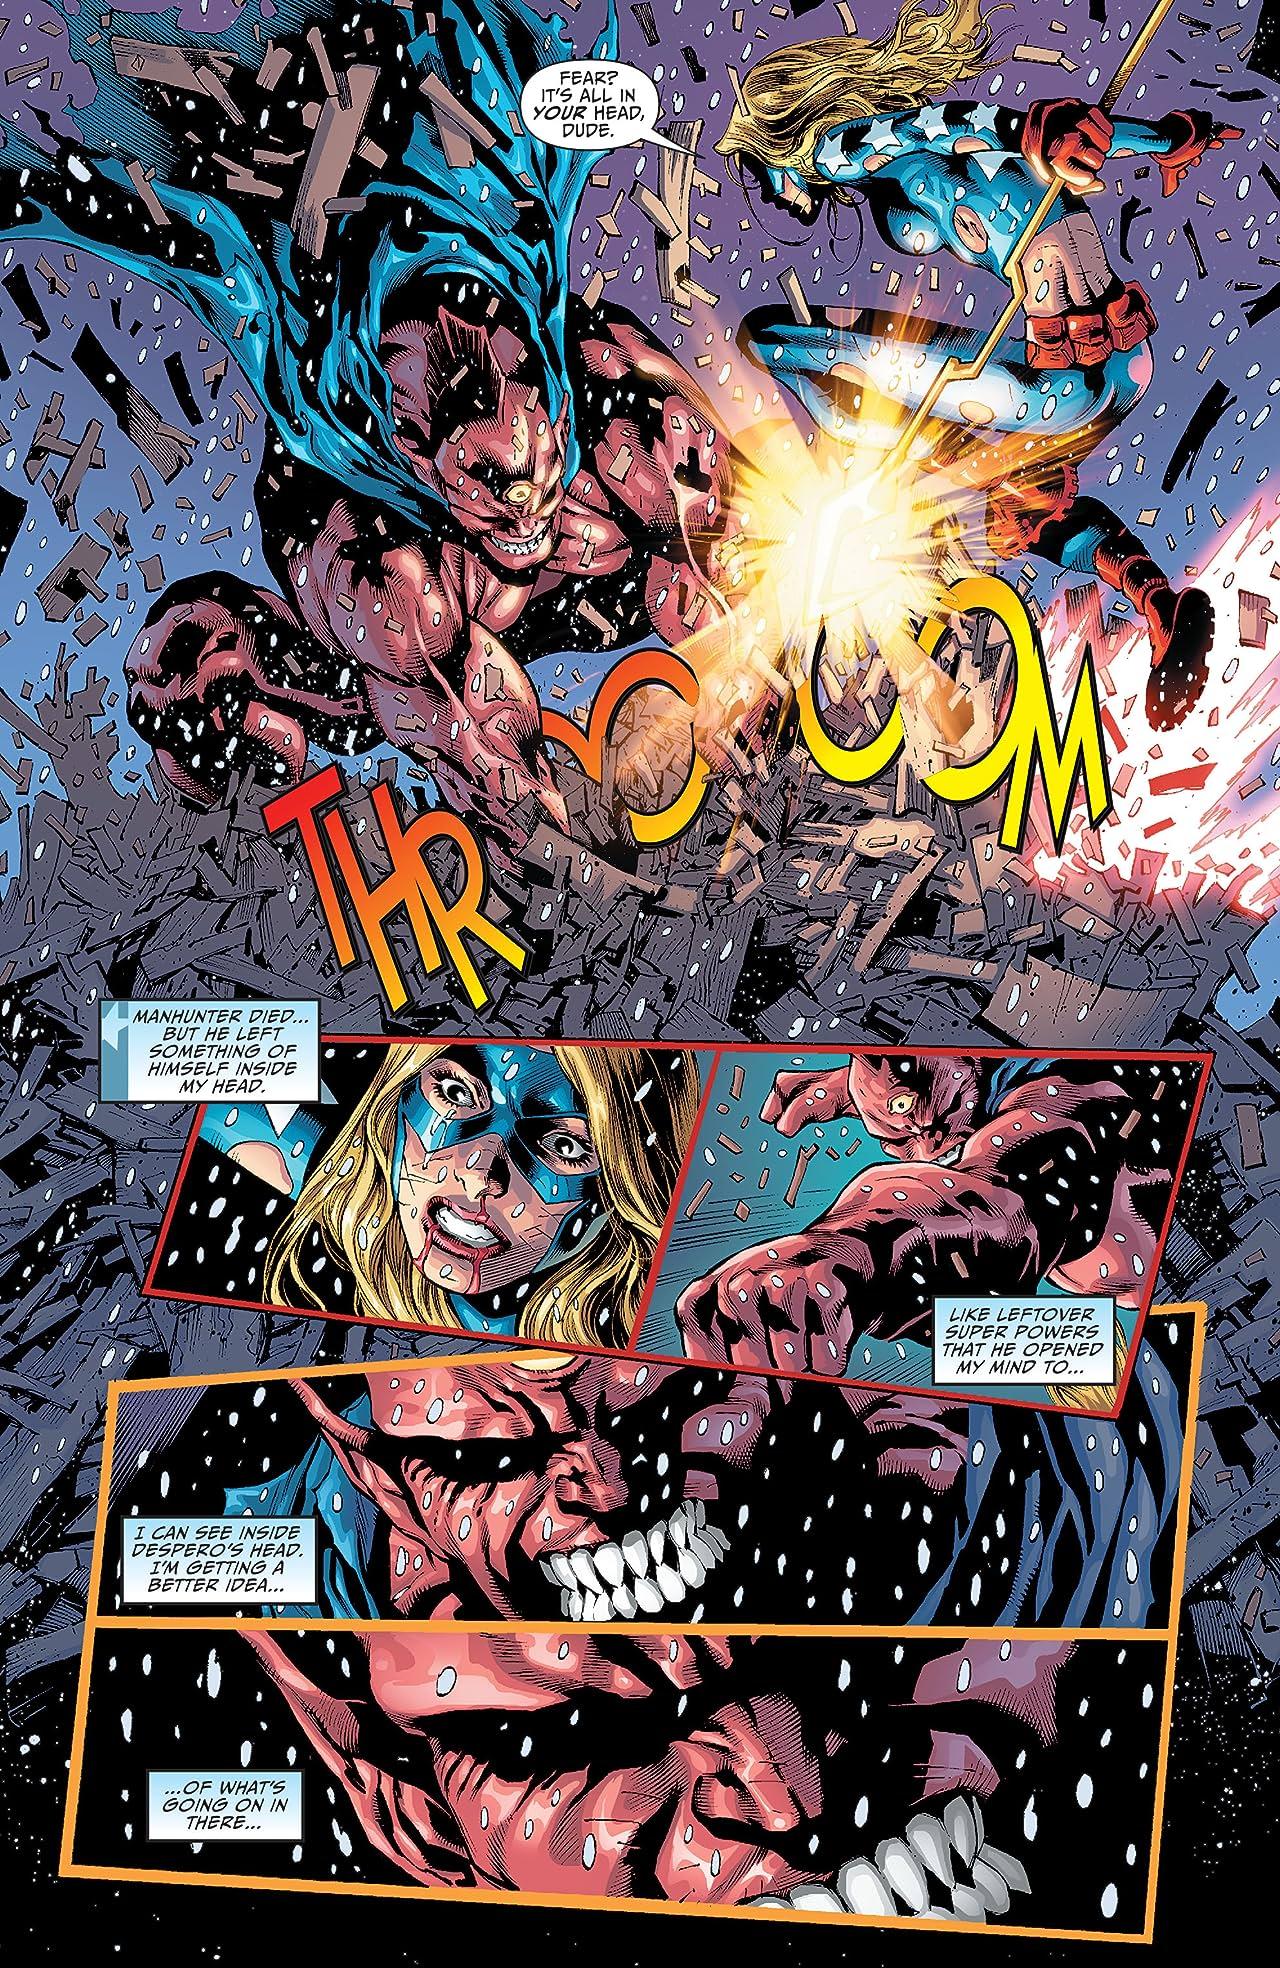 Justice League of America (2013-2015) #13